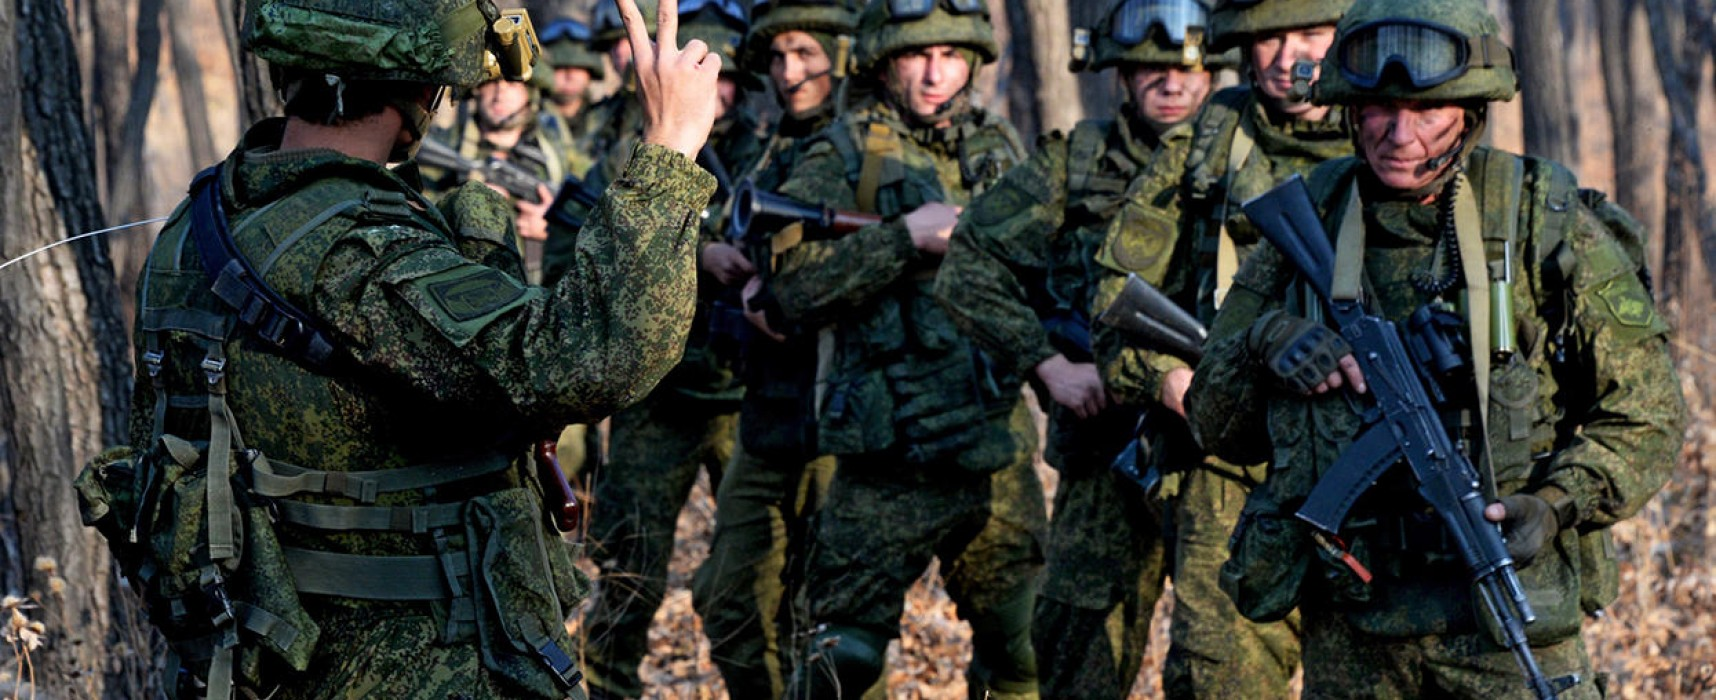 Mark Galeotti: el potencial militar de Rusia es un farol